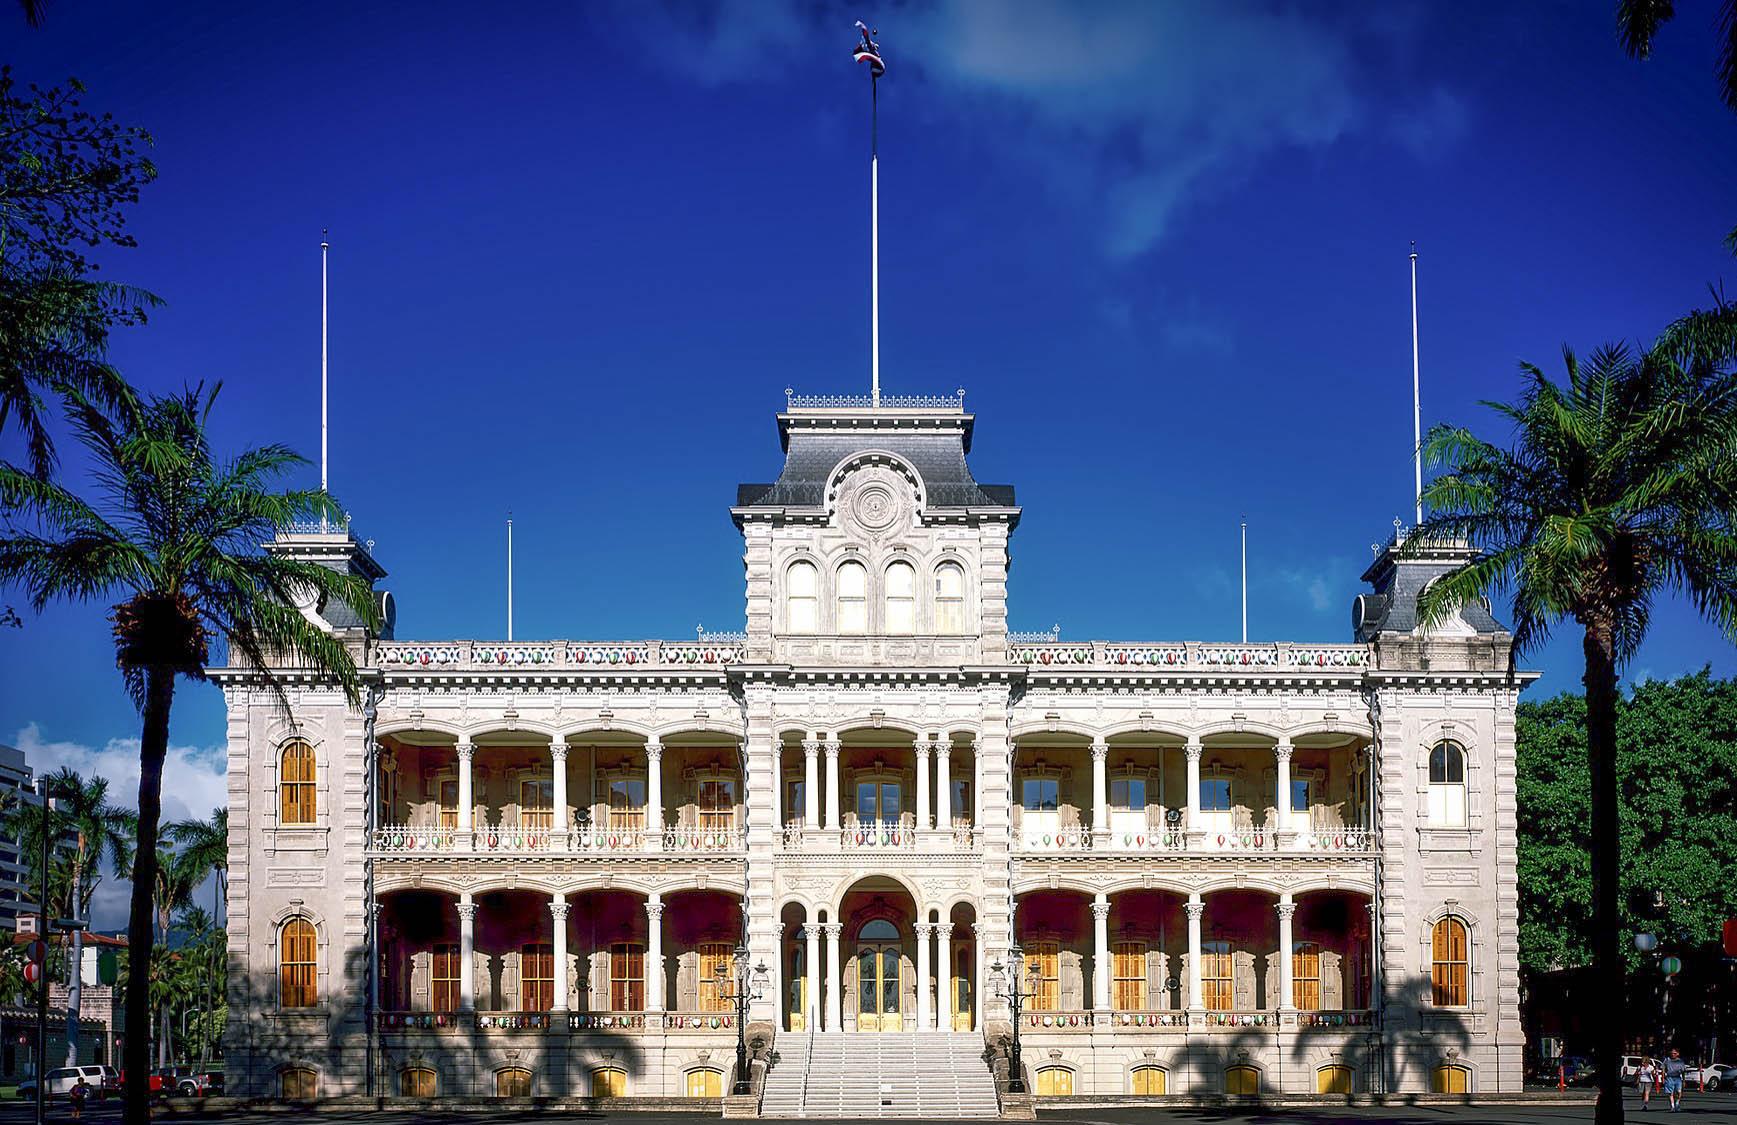 Iolani Palace, home to Hawaii's last monarchs